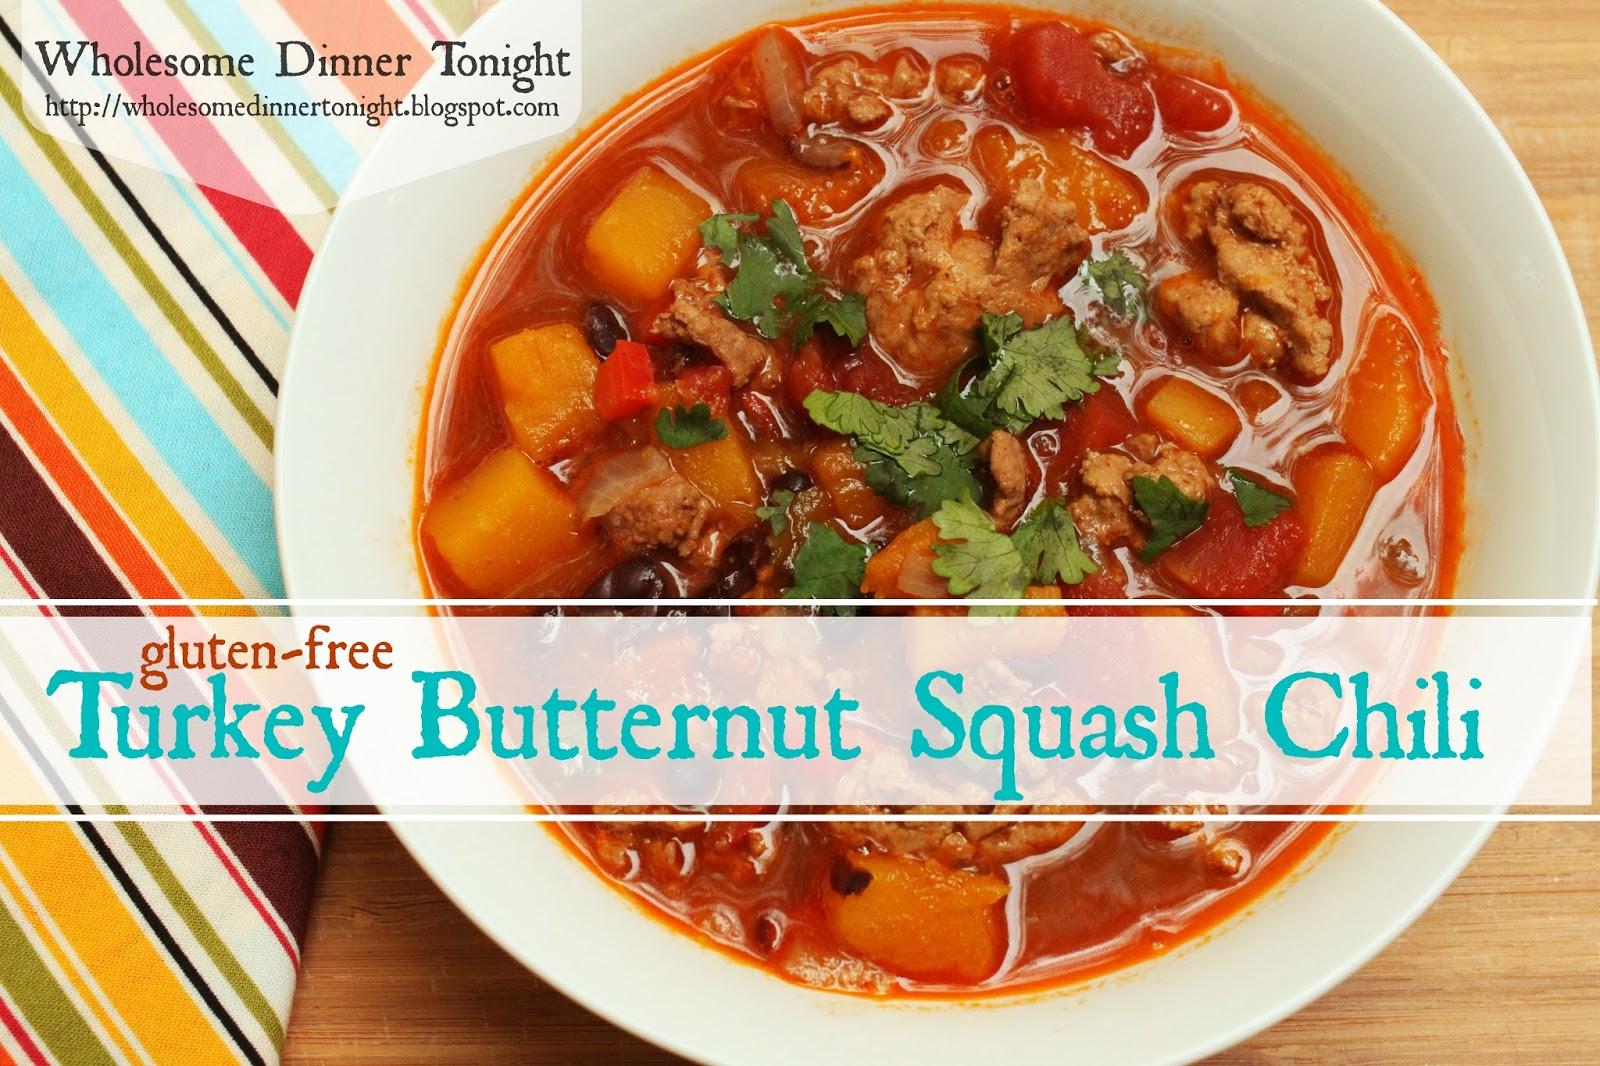 Wholesome Dinner Tonight: Turkey Butternut Squash Chili {Gluten-free}